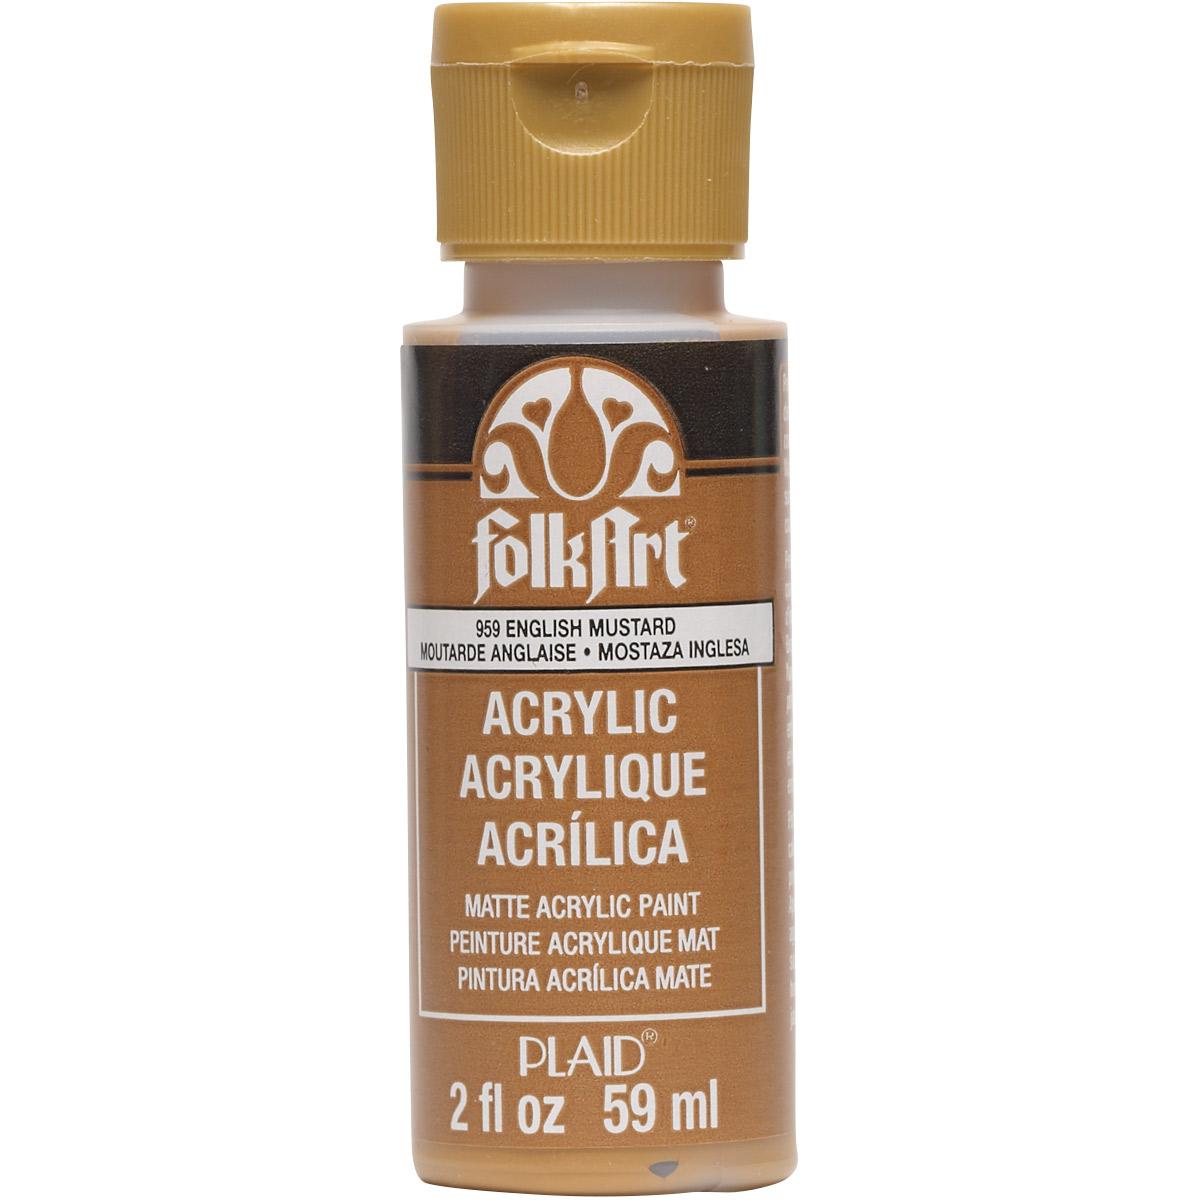 FolkArt ® Acrylic Colors - English Mustard, 2 oz. - 959